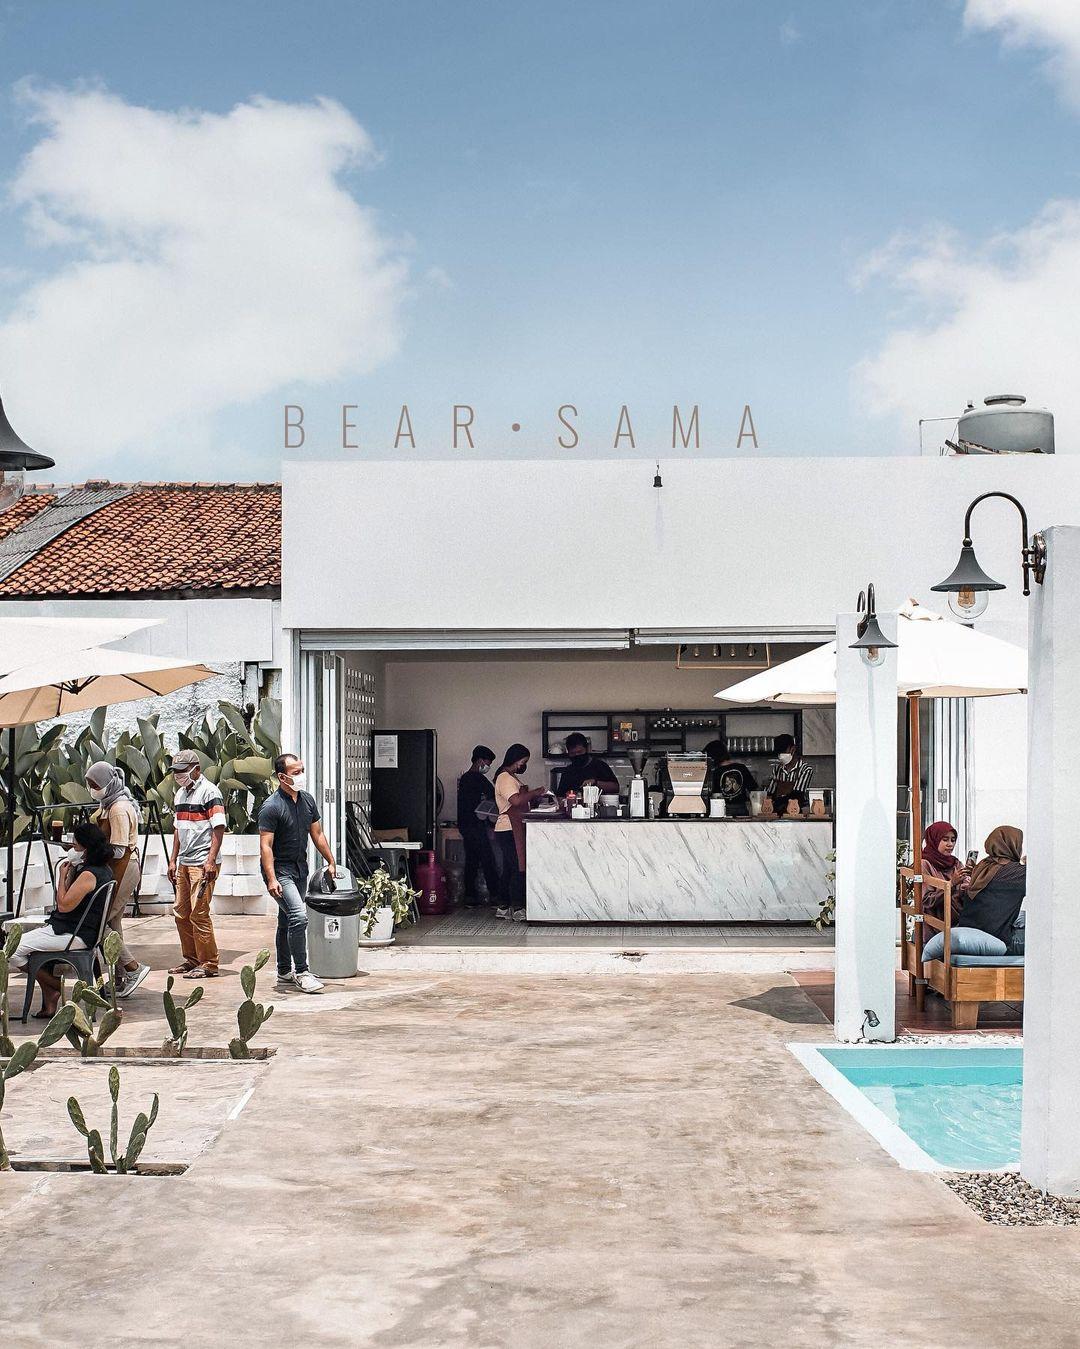 Bear Sama Cafe Meruya Image From @anggatusan